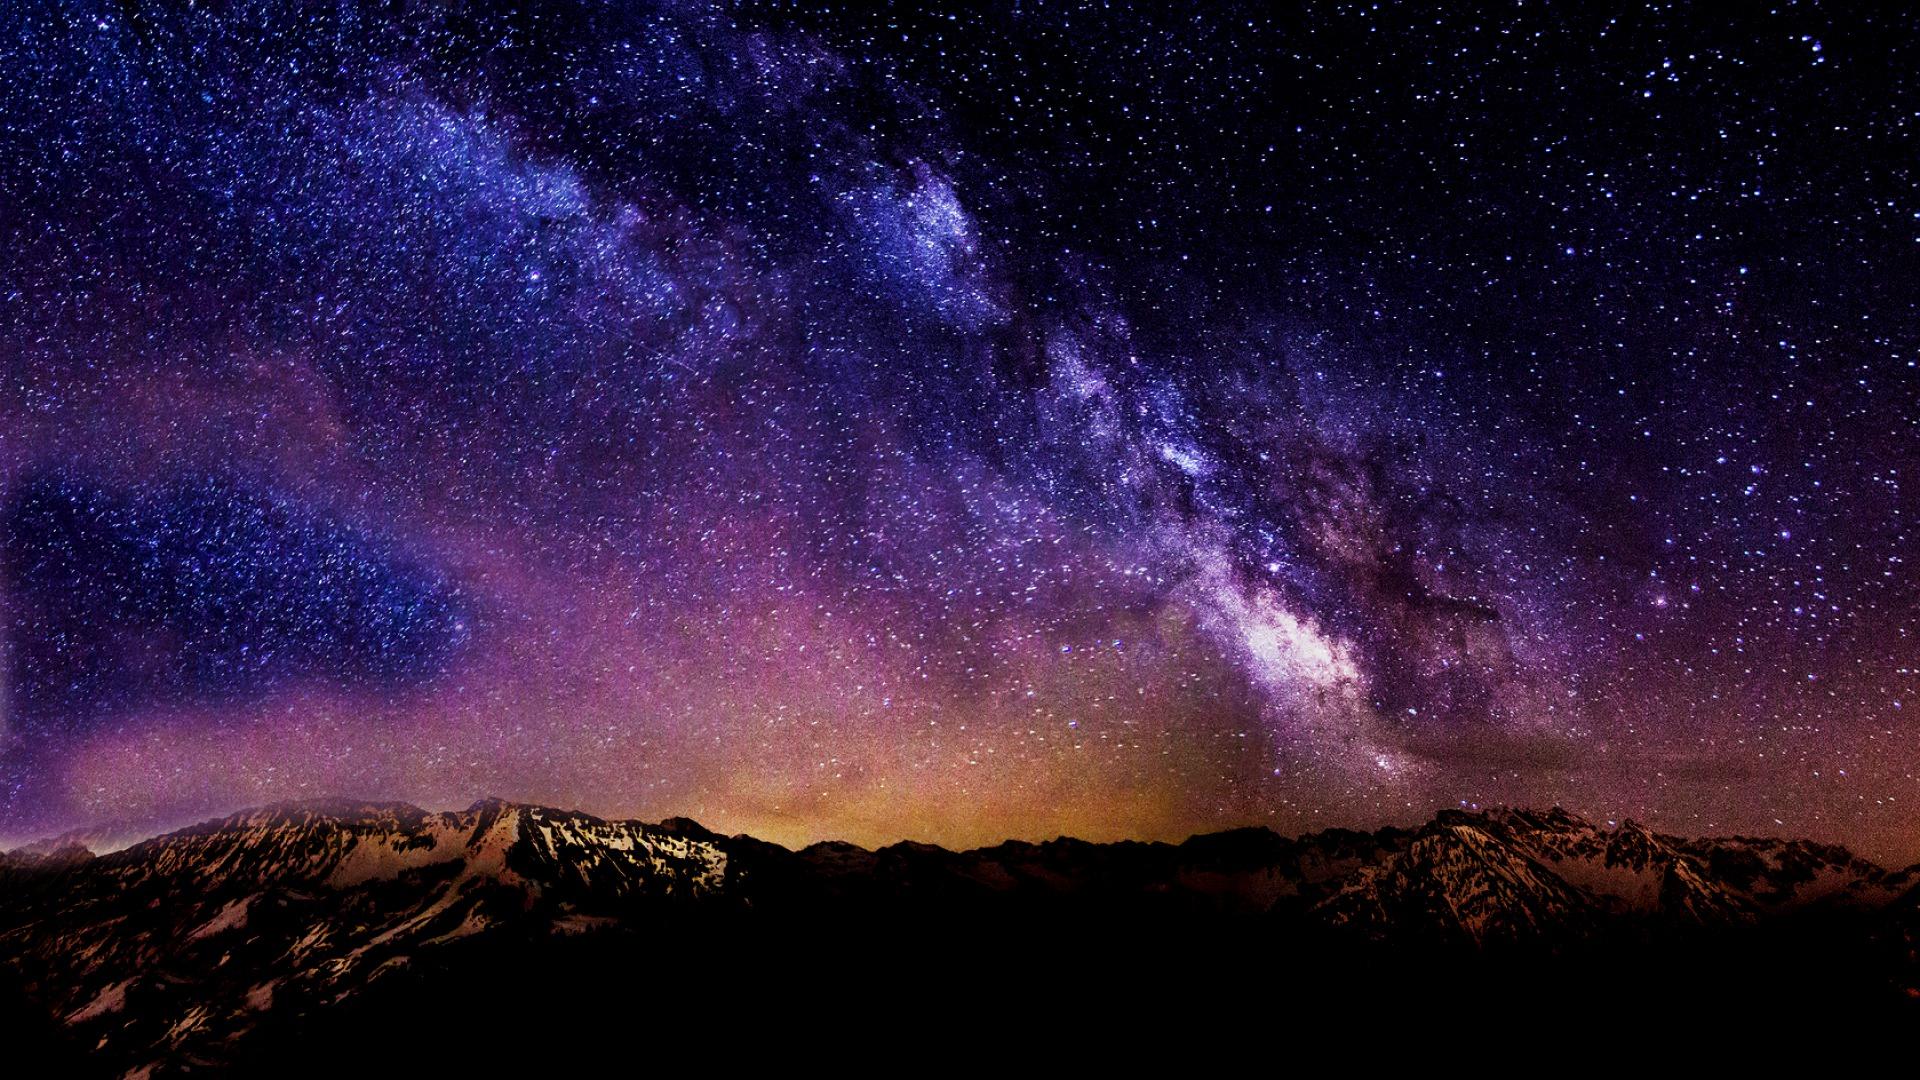 night sky wallpaper images 1920x1080